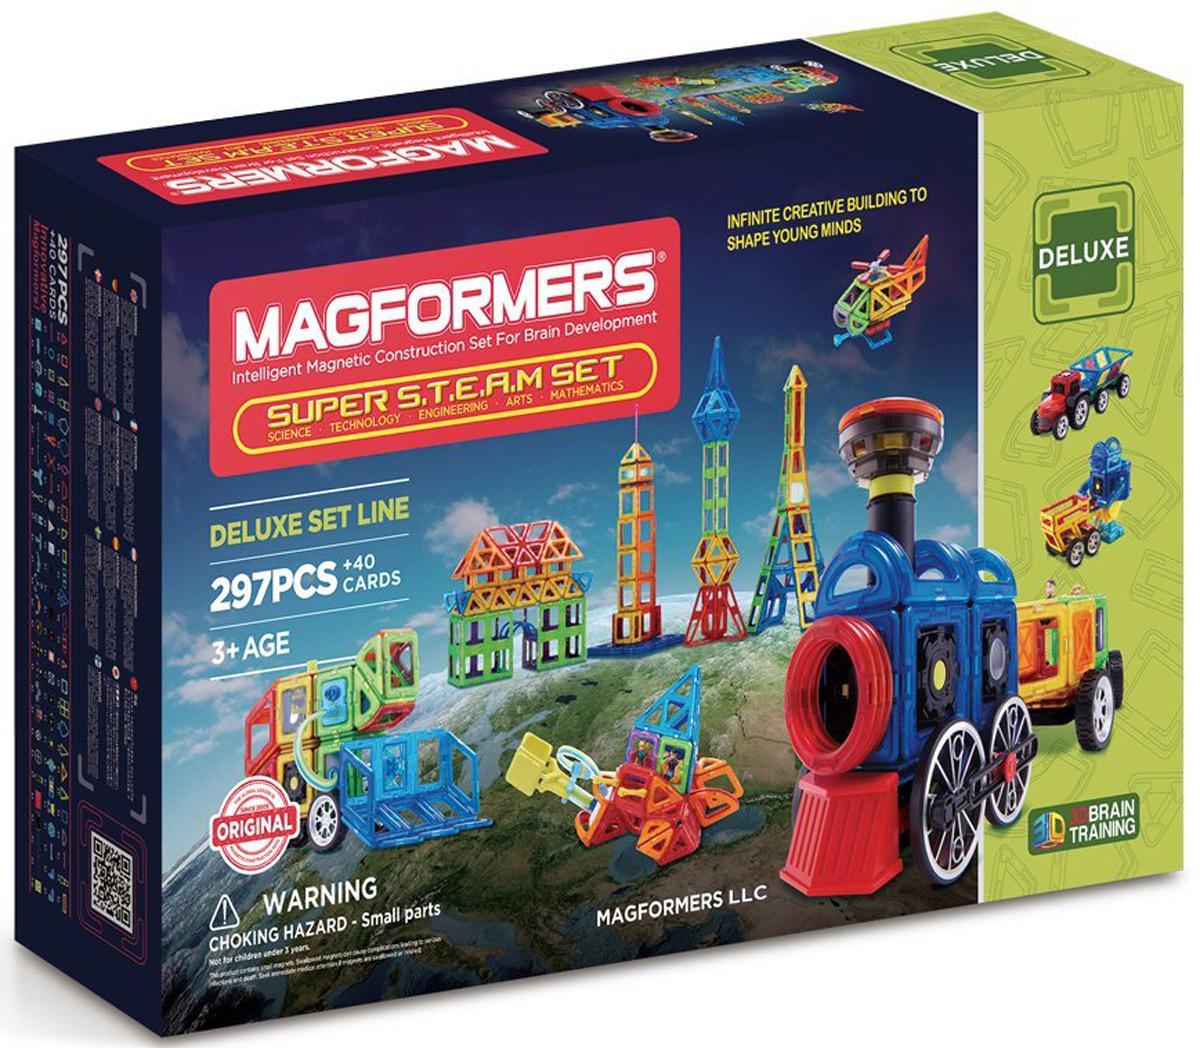 Magformers Конструктор Super Steam Set bandai фигурка o p s master star the portgas d ace 35 см